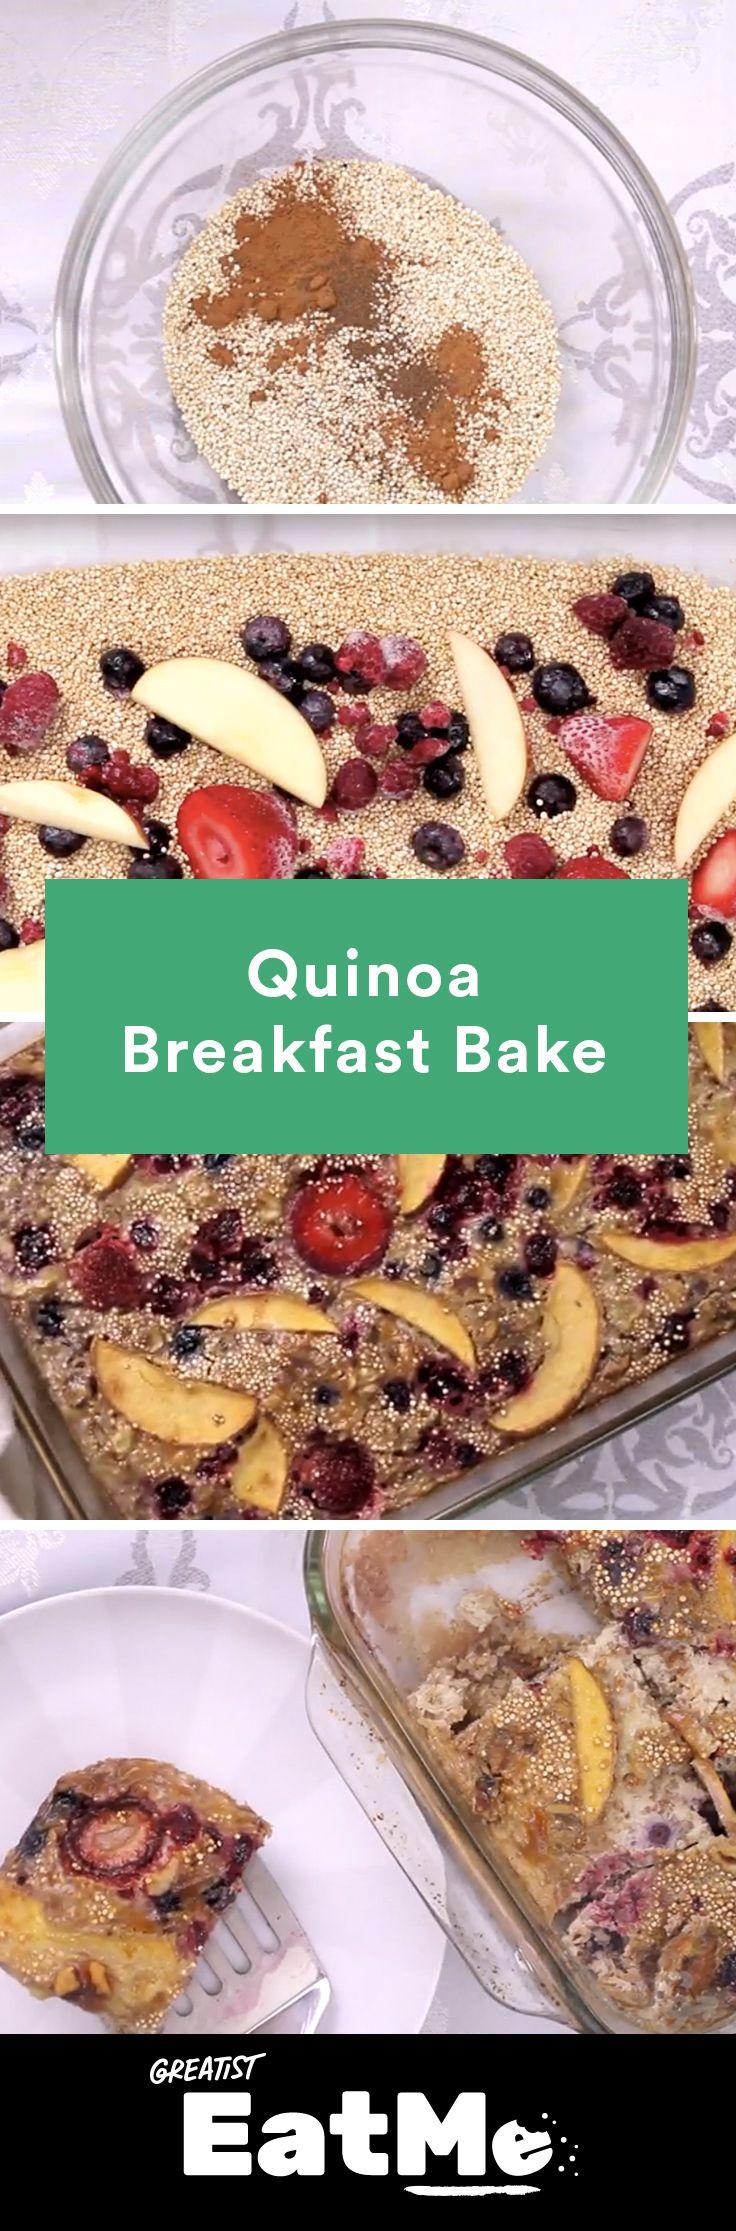 Breakfast is served—for the next 5 days! #healthy #quinoa #breakfast #bake http://greatist.com/eat/quinoa-breakfast-bake-recipe-video